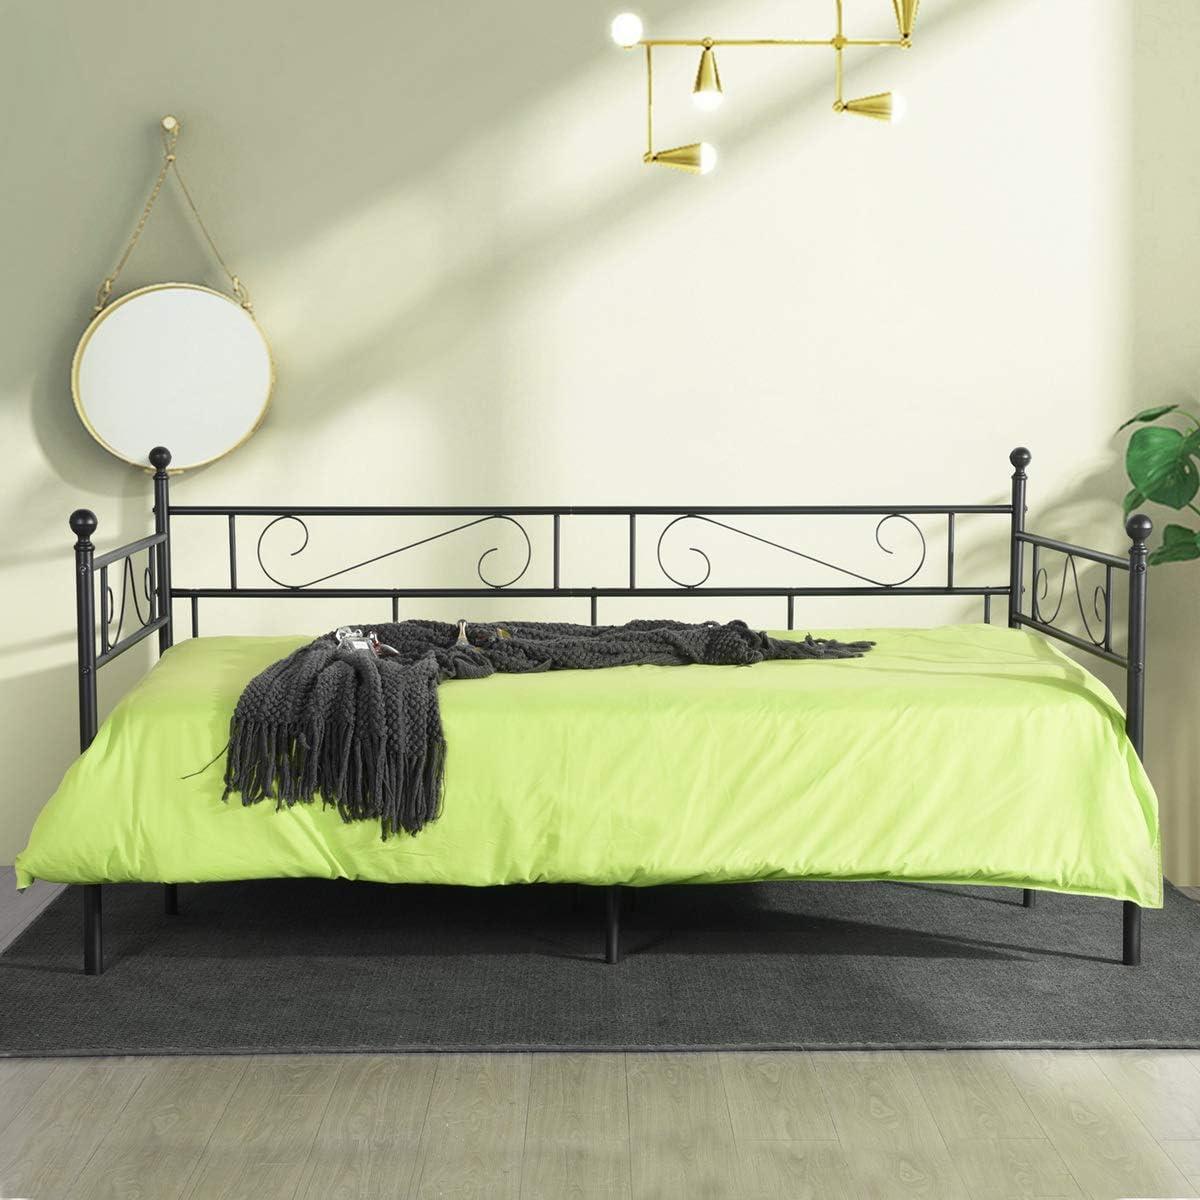 LiePu Sofá Cama Metálica Diván Cama para Dormitorio Salón Cuarto de Invitados,Adecuado para Colchón de 90 * 190 cm,Negro